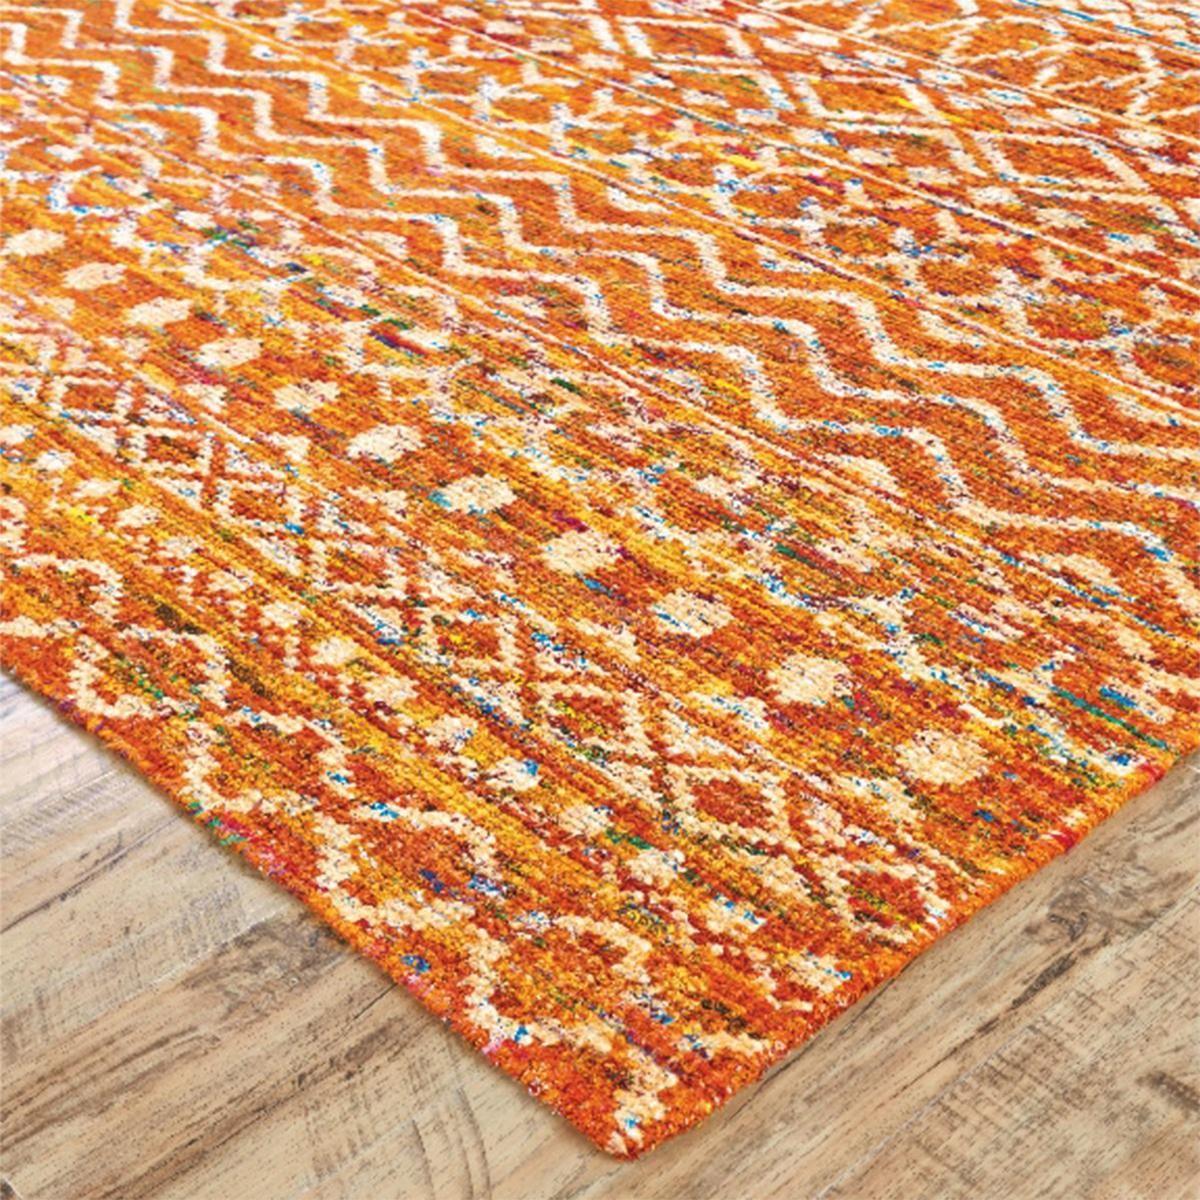 Vibrant Recycled Sari Rug